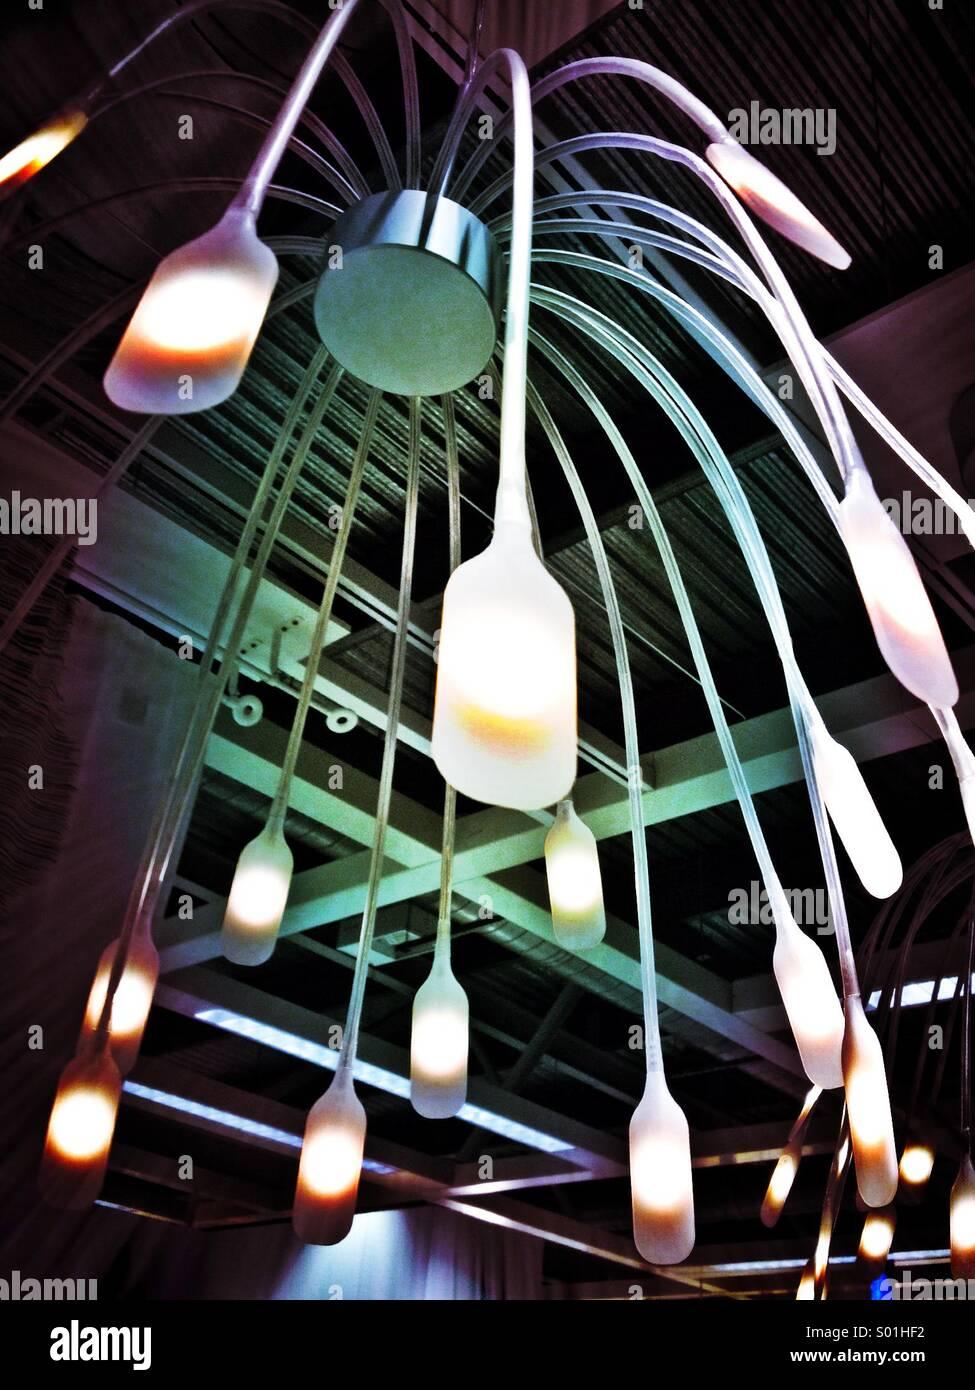 La pantalla de luces Imagen De Stock